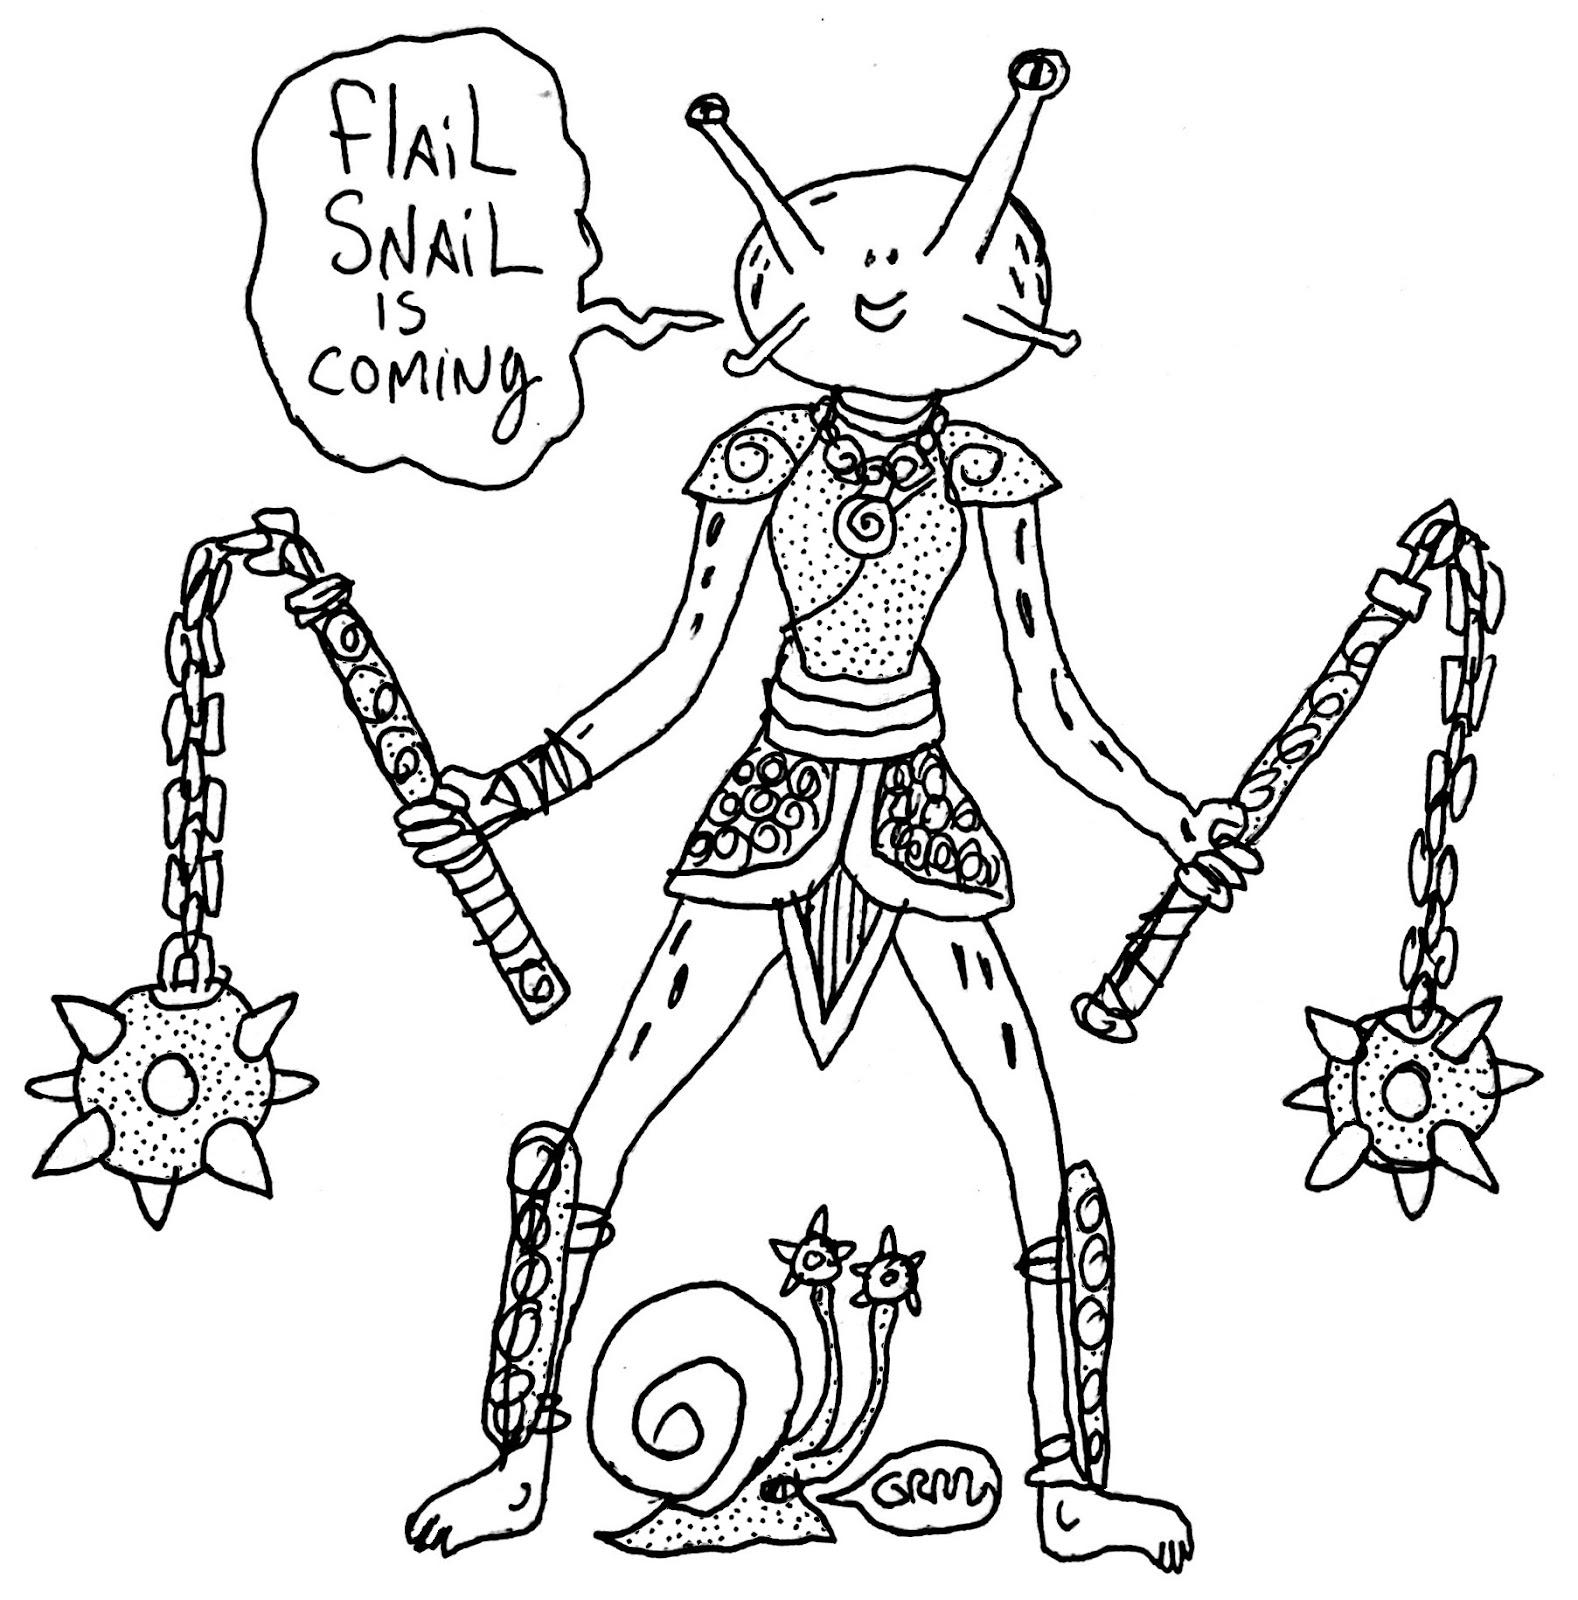 snailflails1.jpg